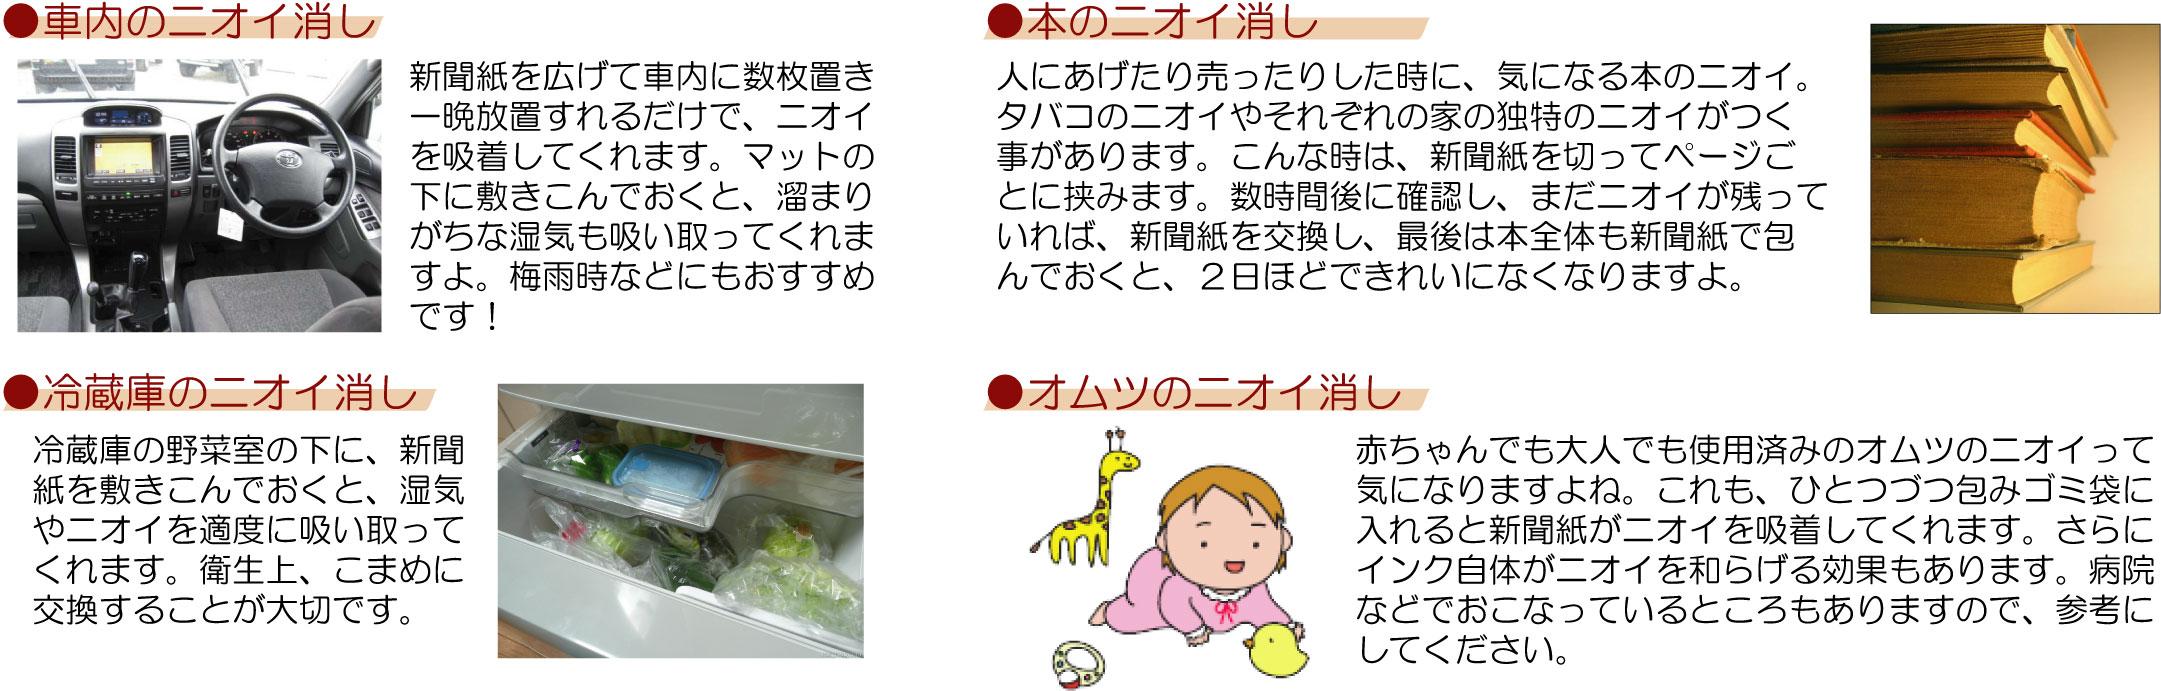 KuraSi-natu-sin68-15.jpg